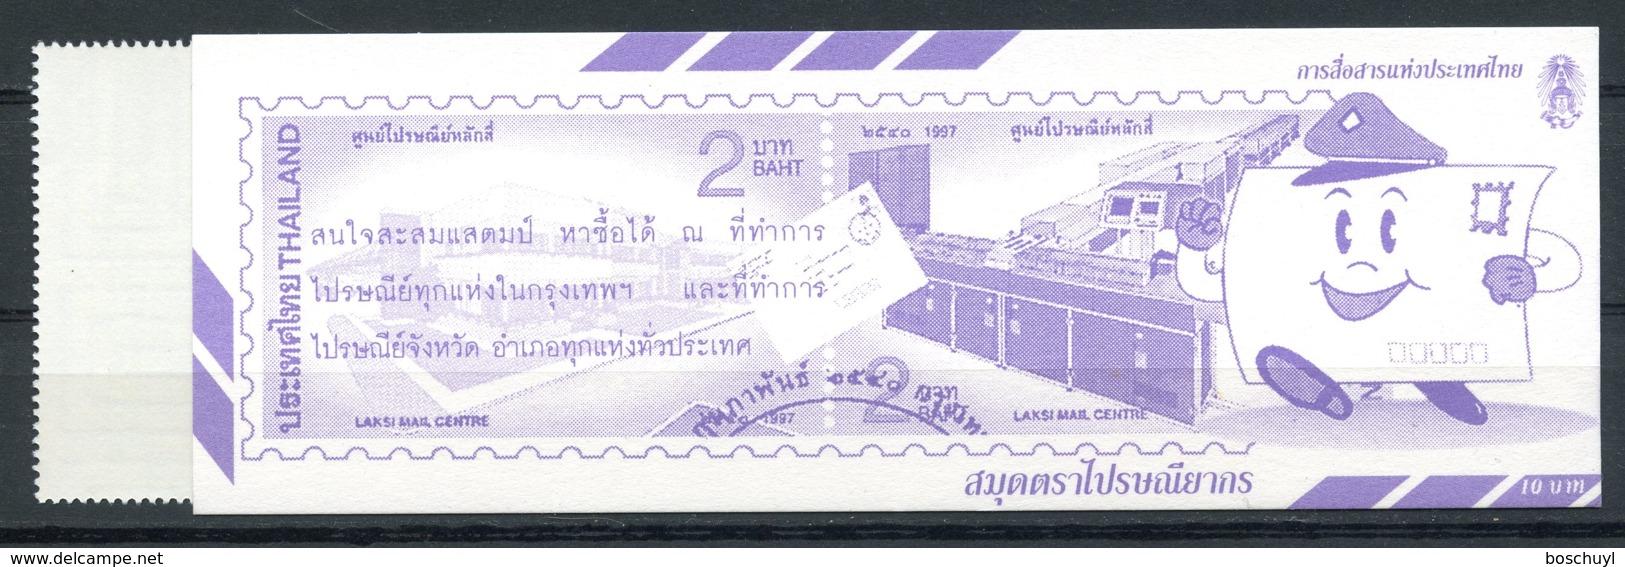 Thailand, 1995, United Nations 50th Anniversary, MNH Booklet, Michel 1661 - Thaïlande